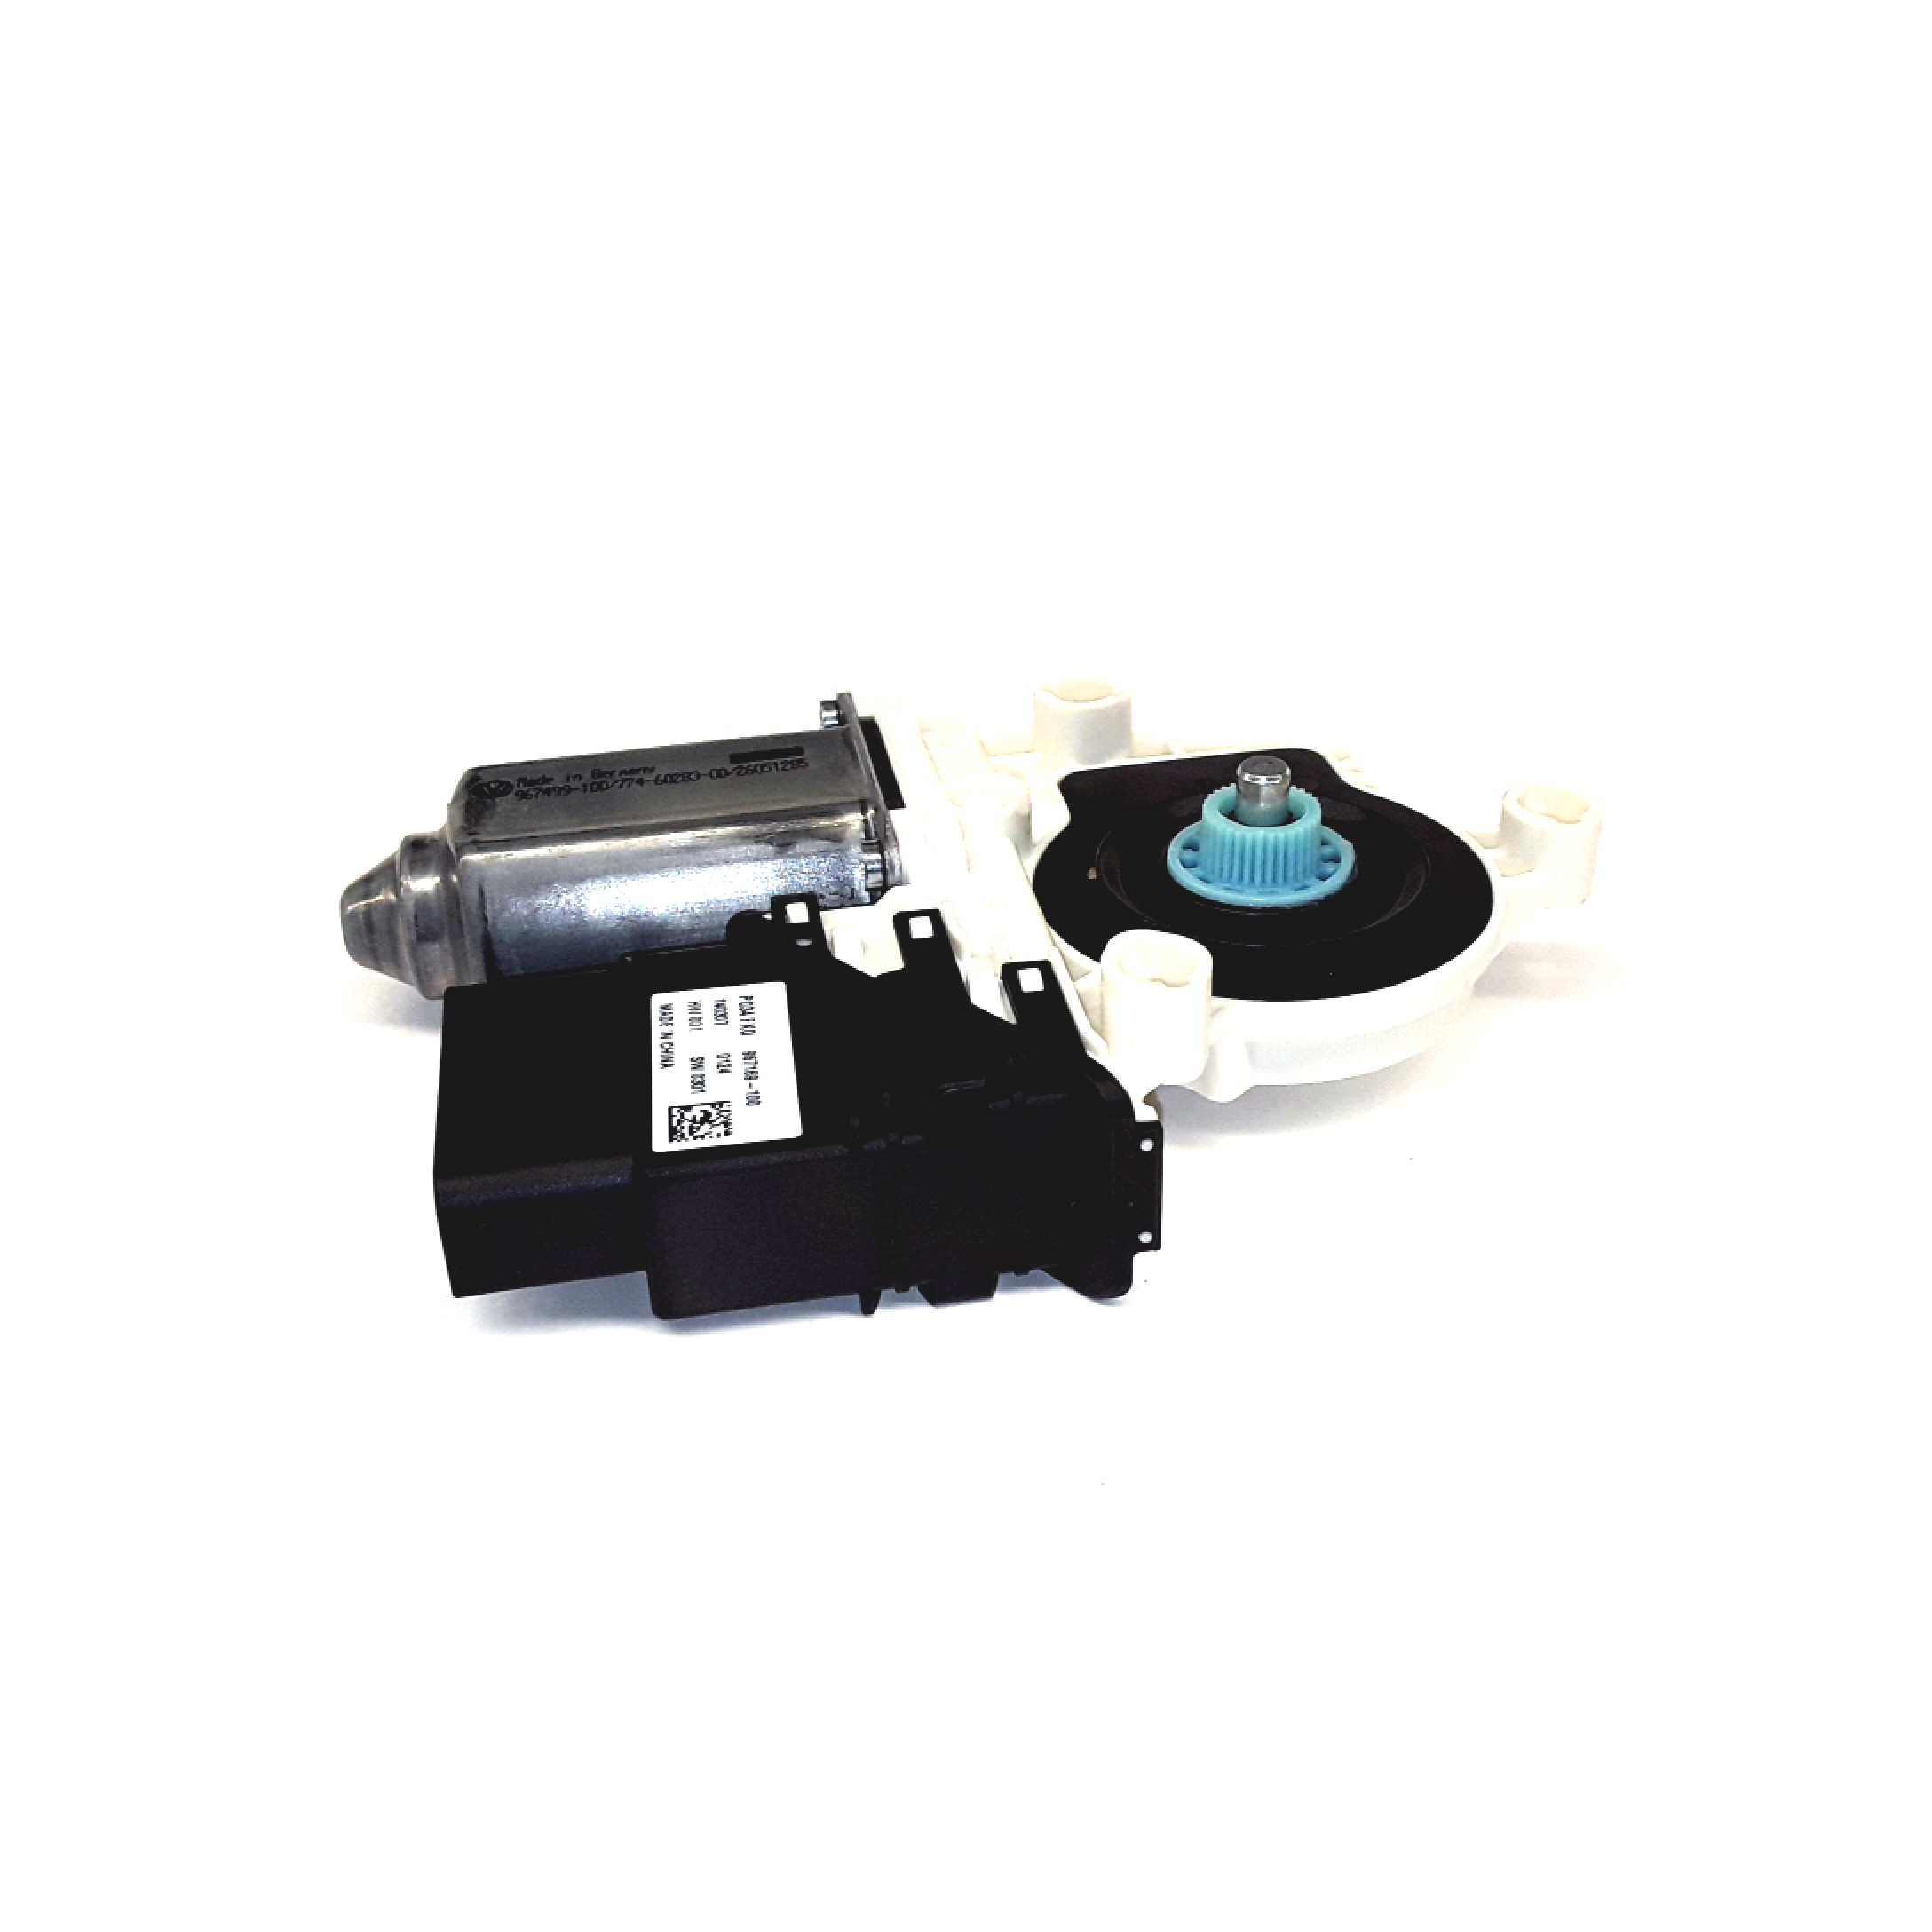 1c2959802d mx1 audi window lifter motor jim ellis audi for Electric motor winder jobs in saudi arabia